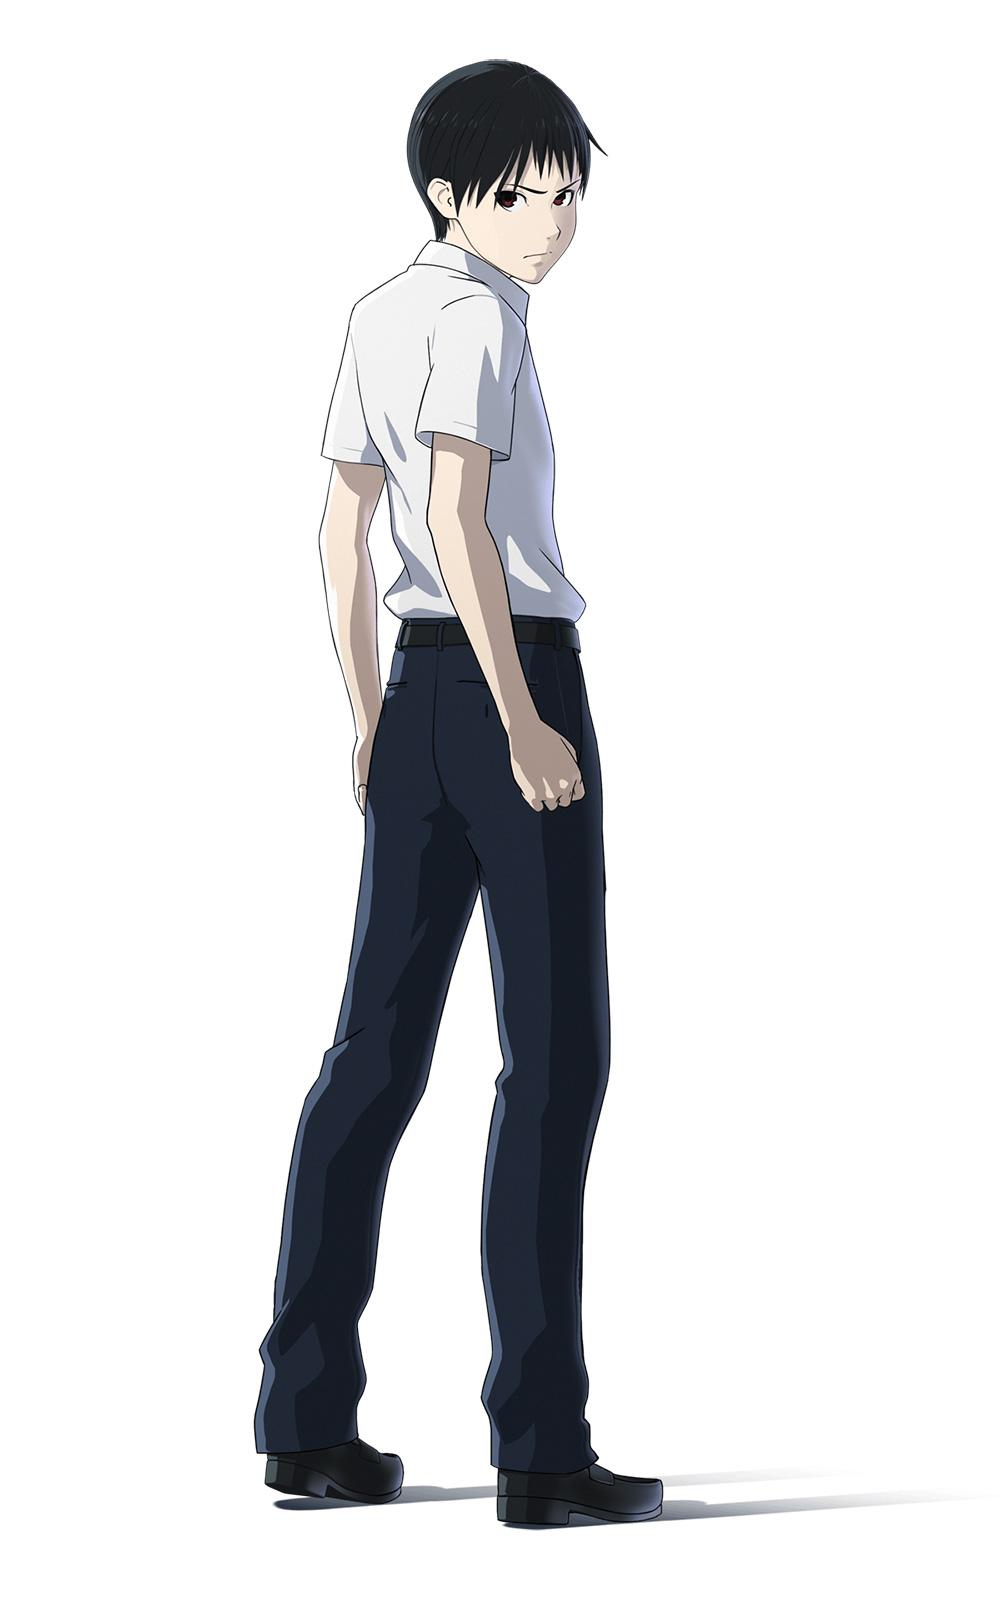 Ajin-Anime-Character-Designs-Kei-Nagai